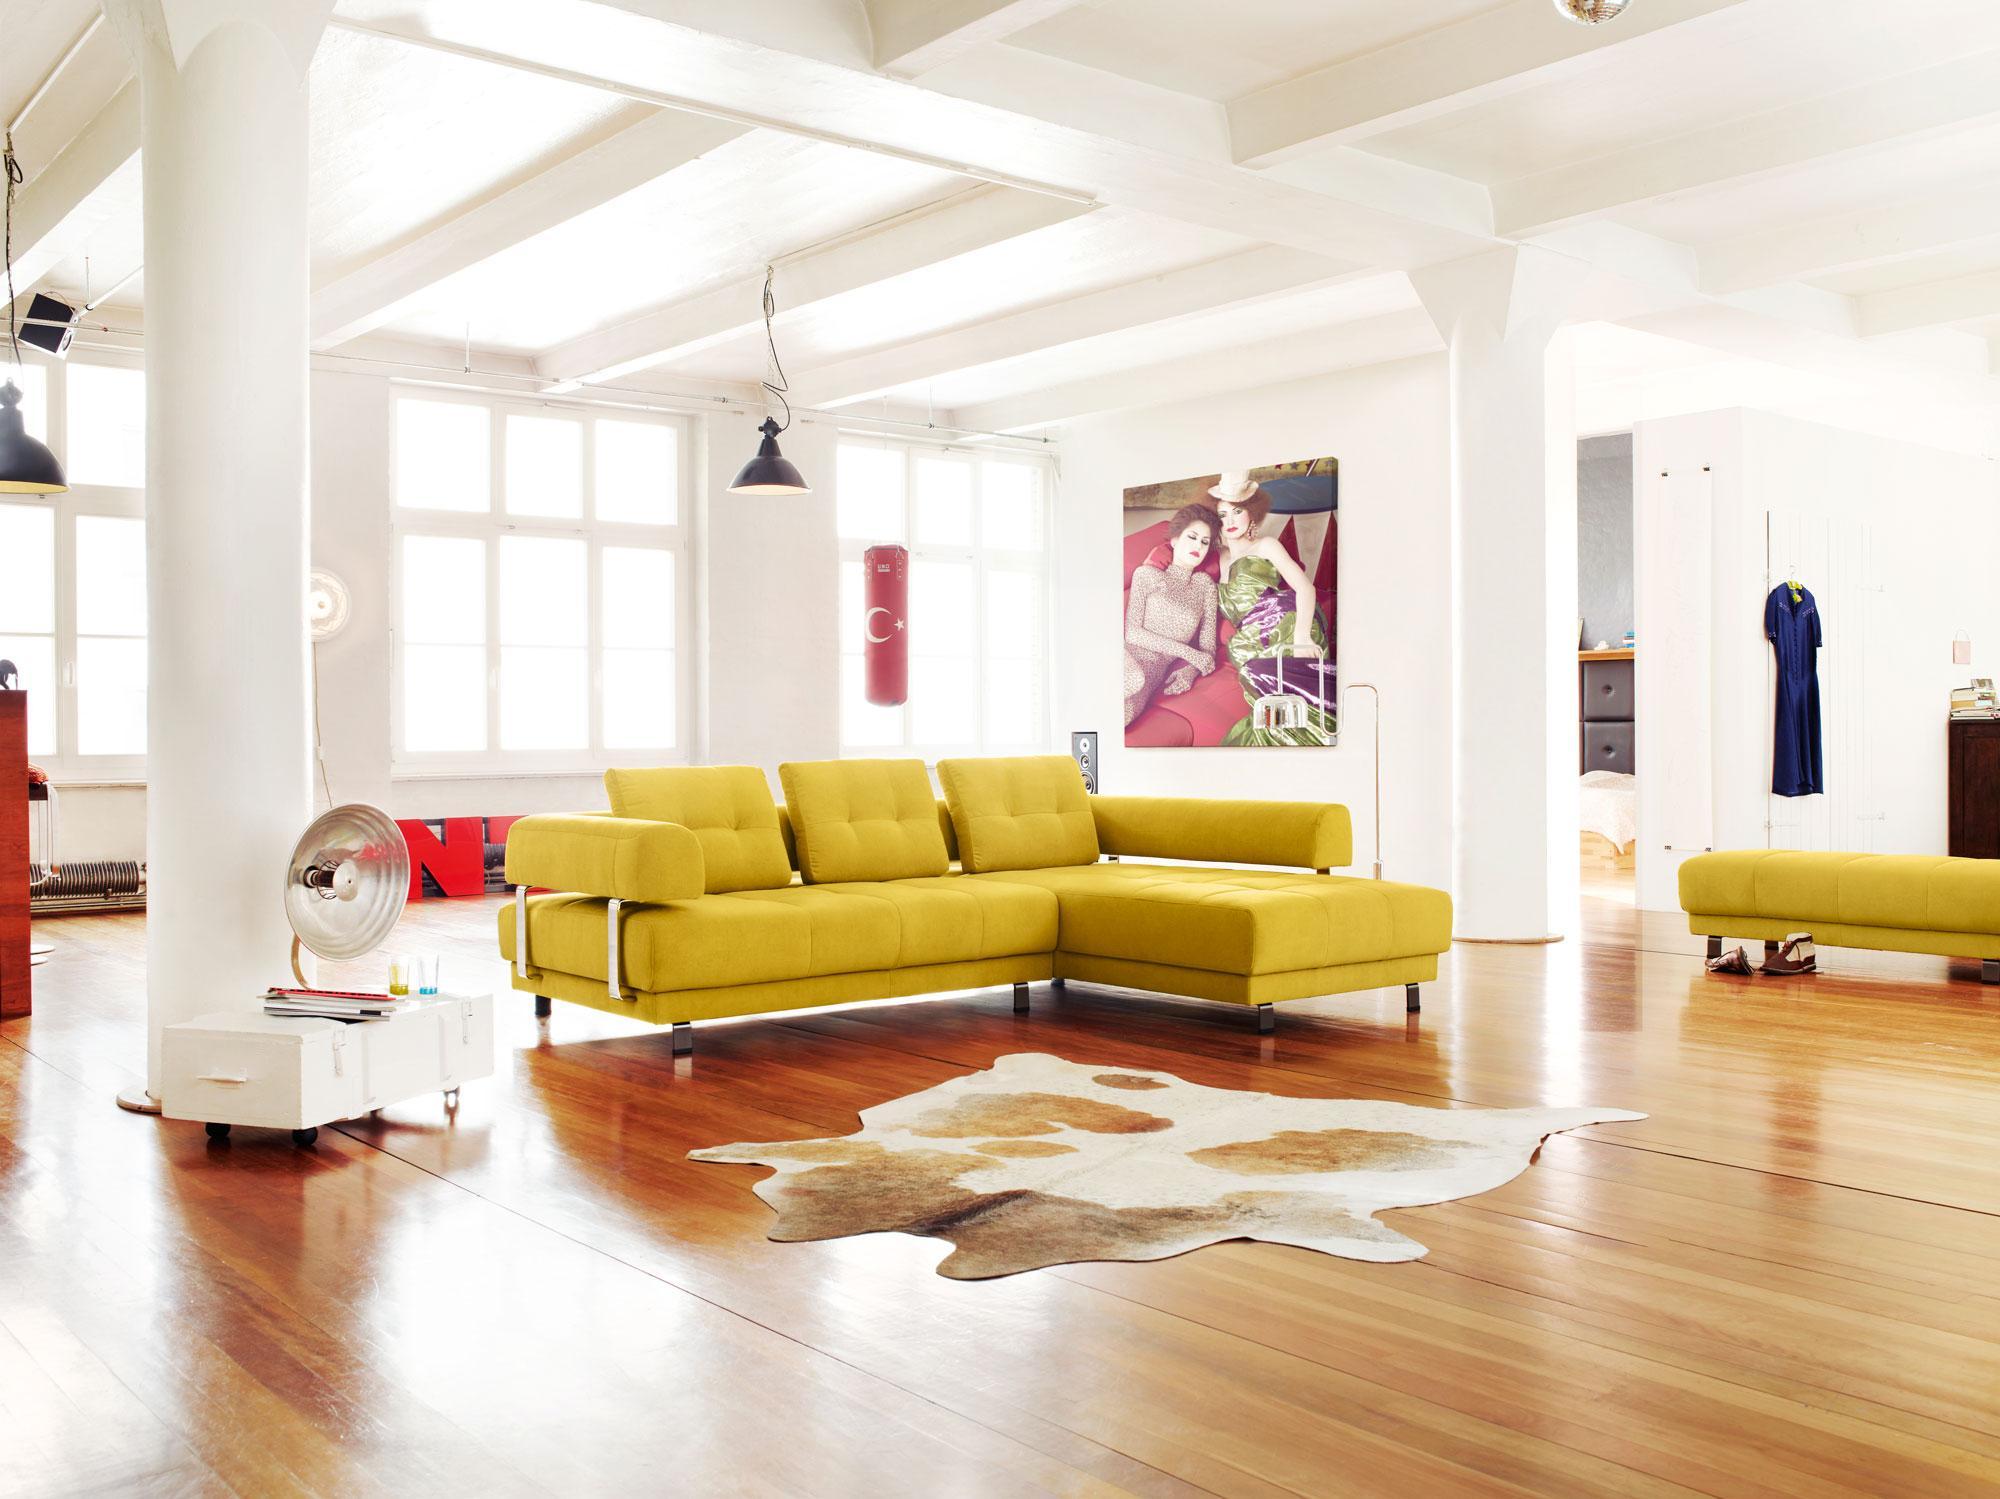 polstermbel rabenau polstermbel with polstermbel with polstermbel rabenau good polstermbel. Black Bedroom Furniture Sets. Home Design Ideas